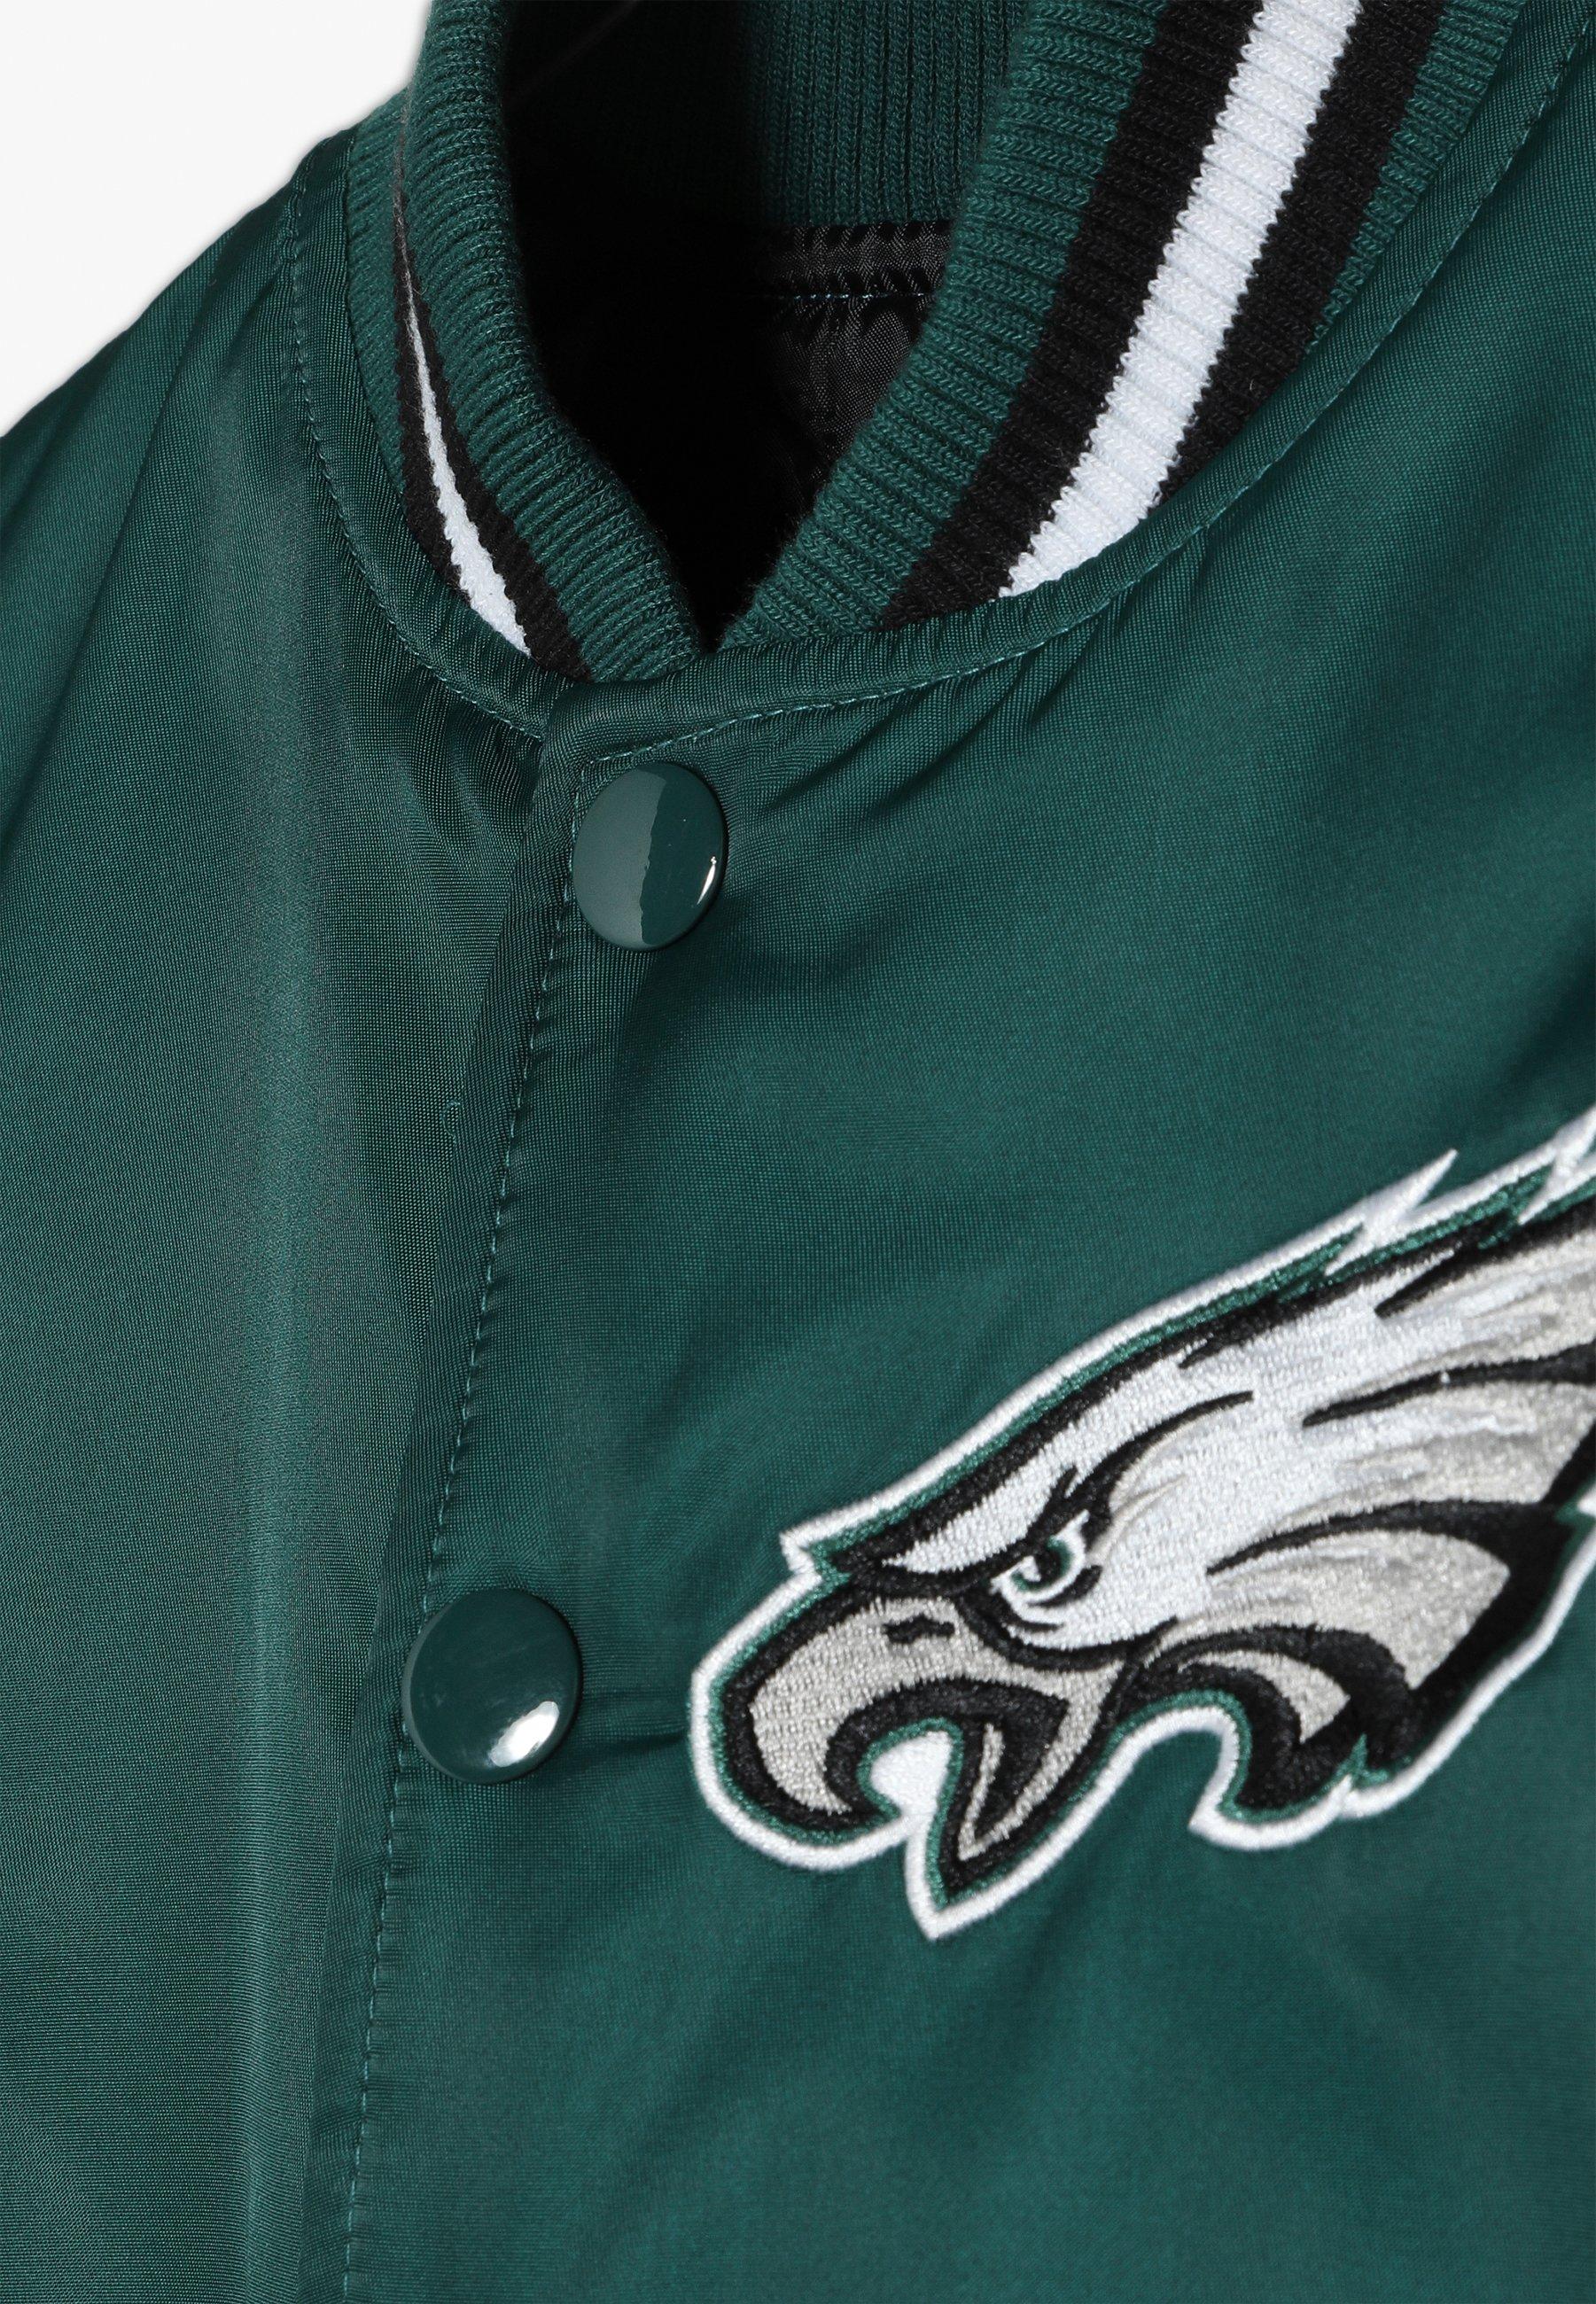 Outerstuff NFL PHILADELPHIA EAGLES VARSITY JACKET